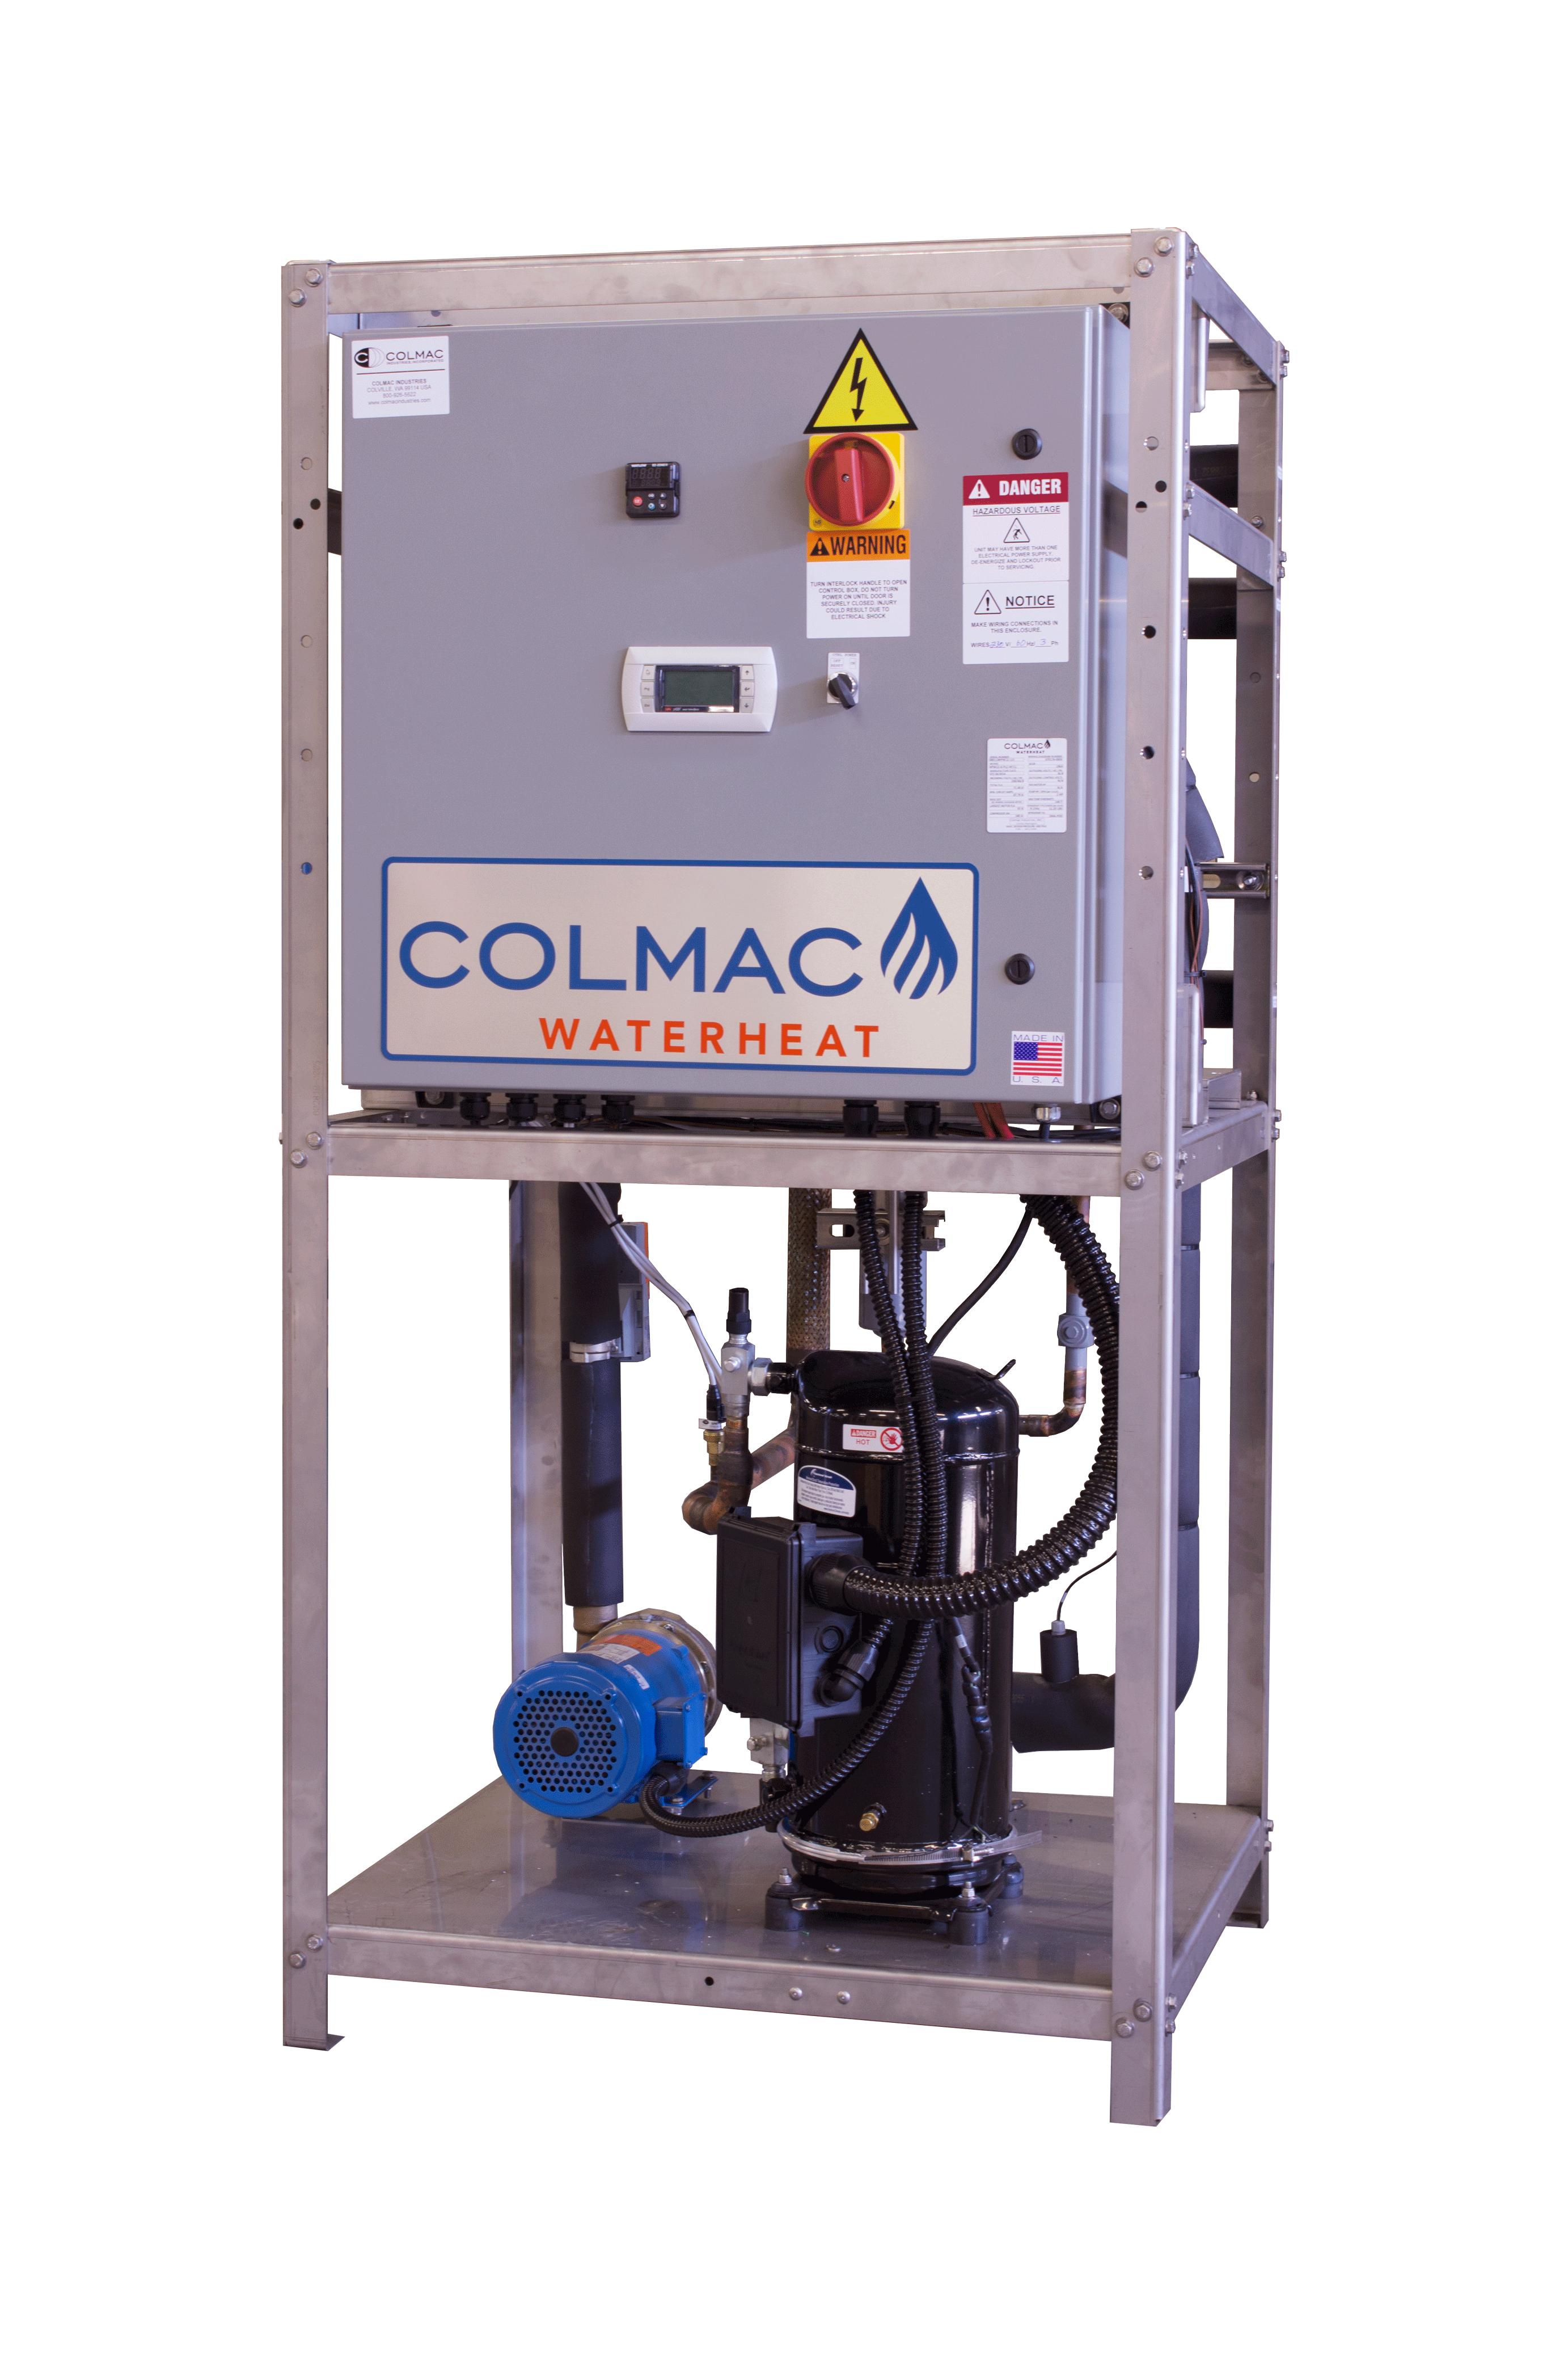 Colmac WaterHeatHPW Series Water Source - Colmac WaterHeat on